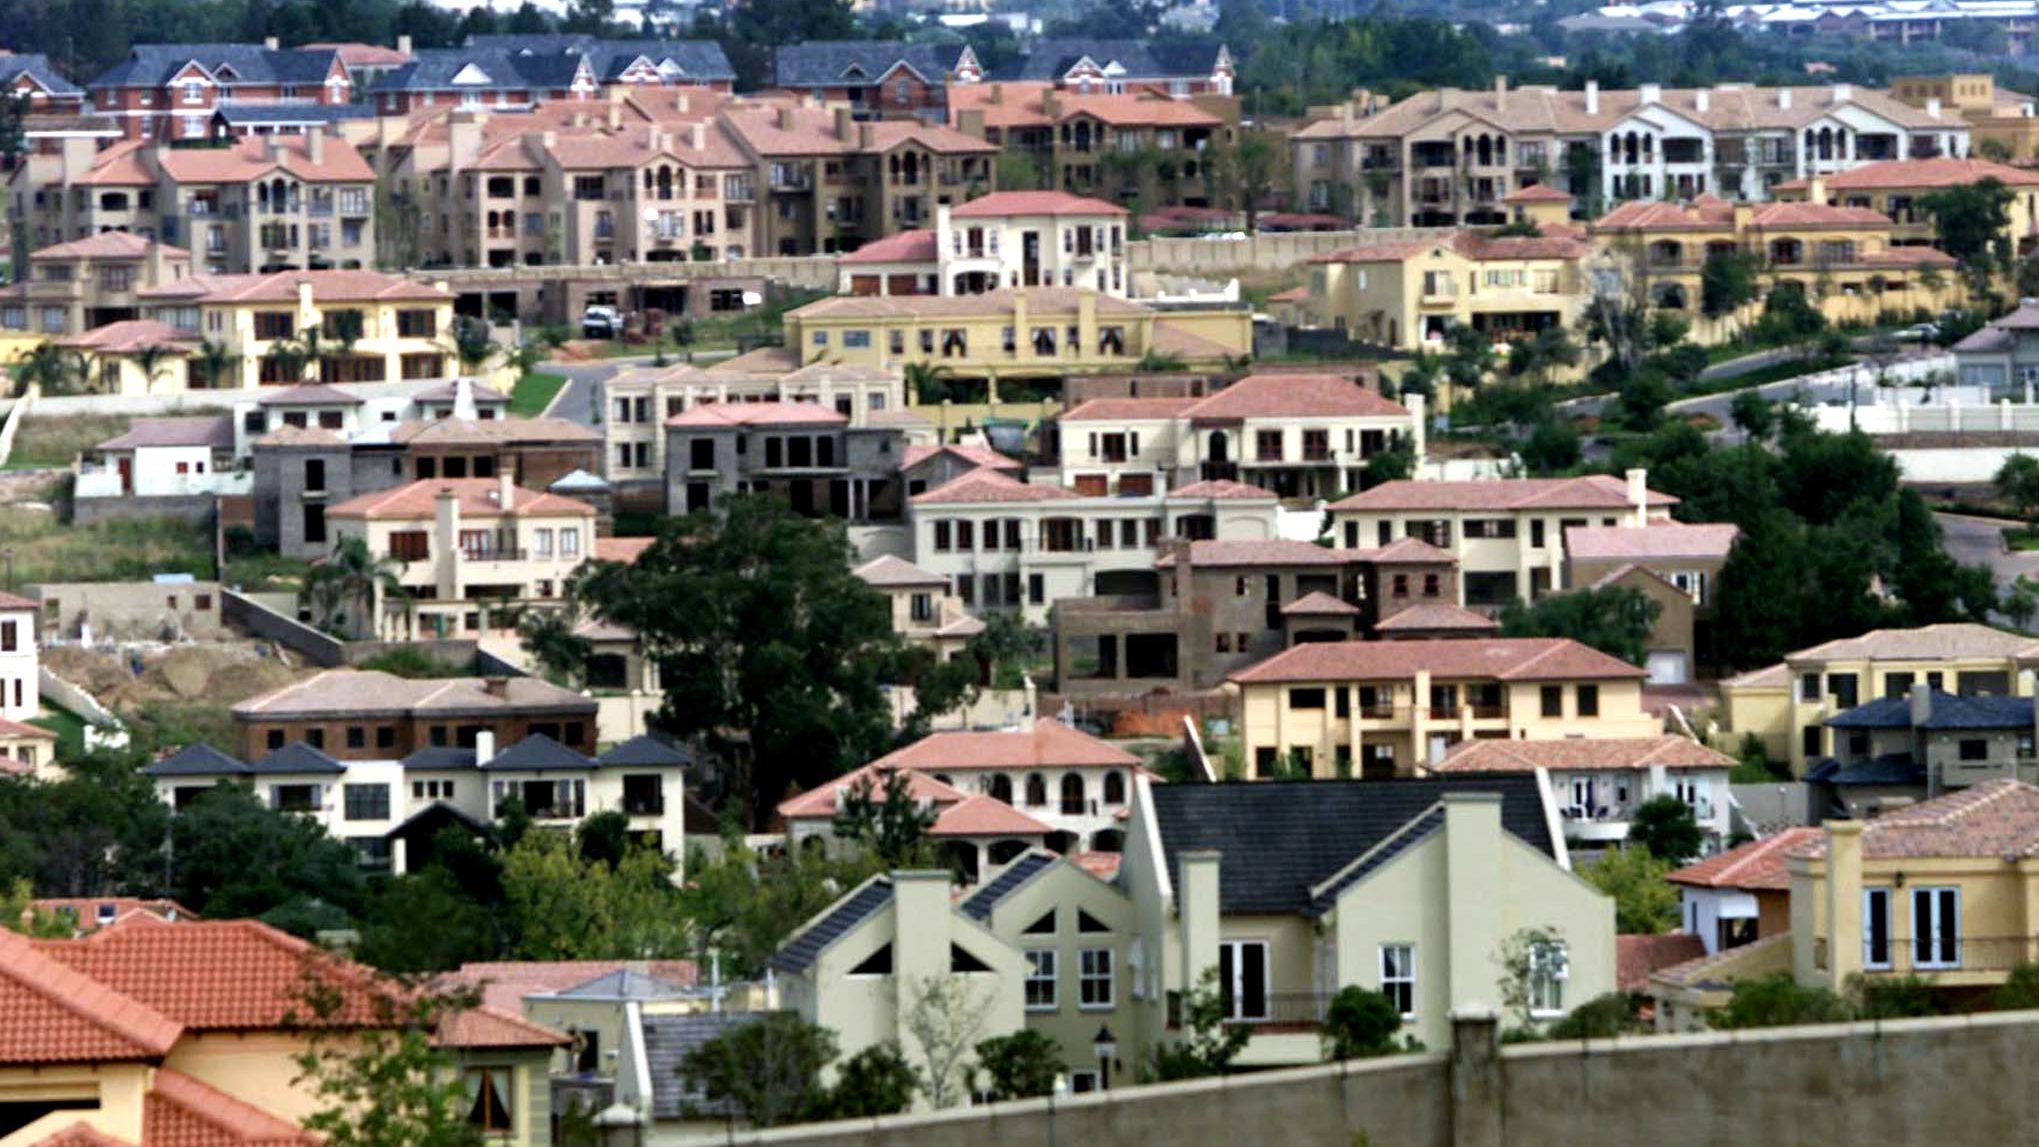 Johannesburg's gated communities echo apartheid-era